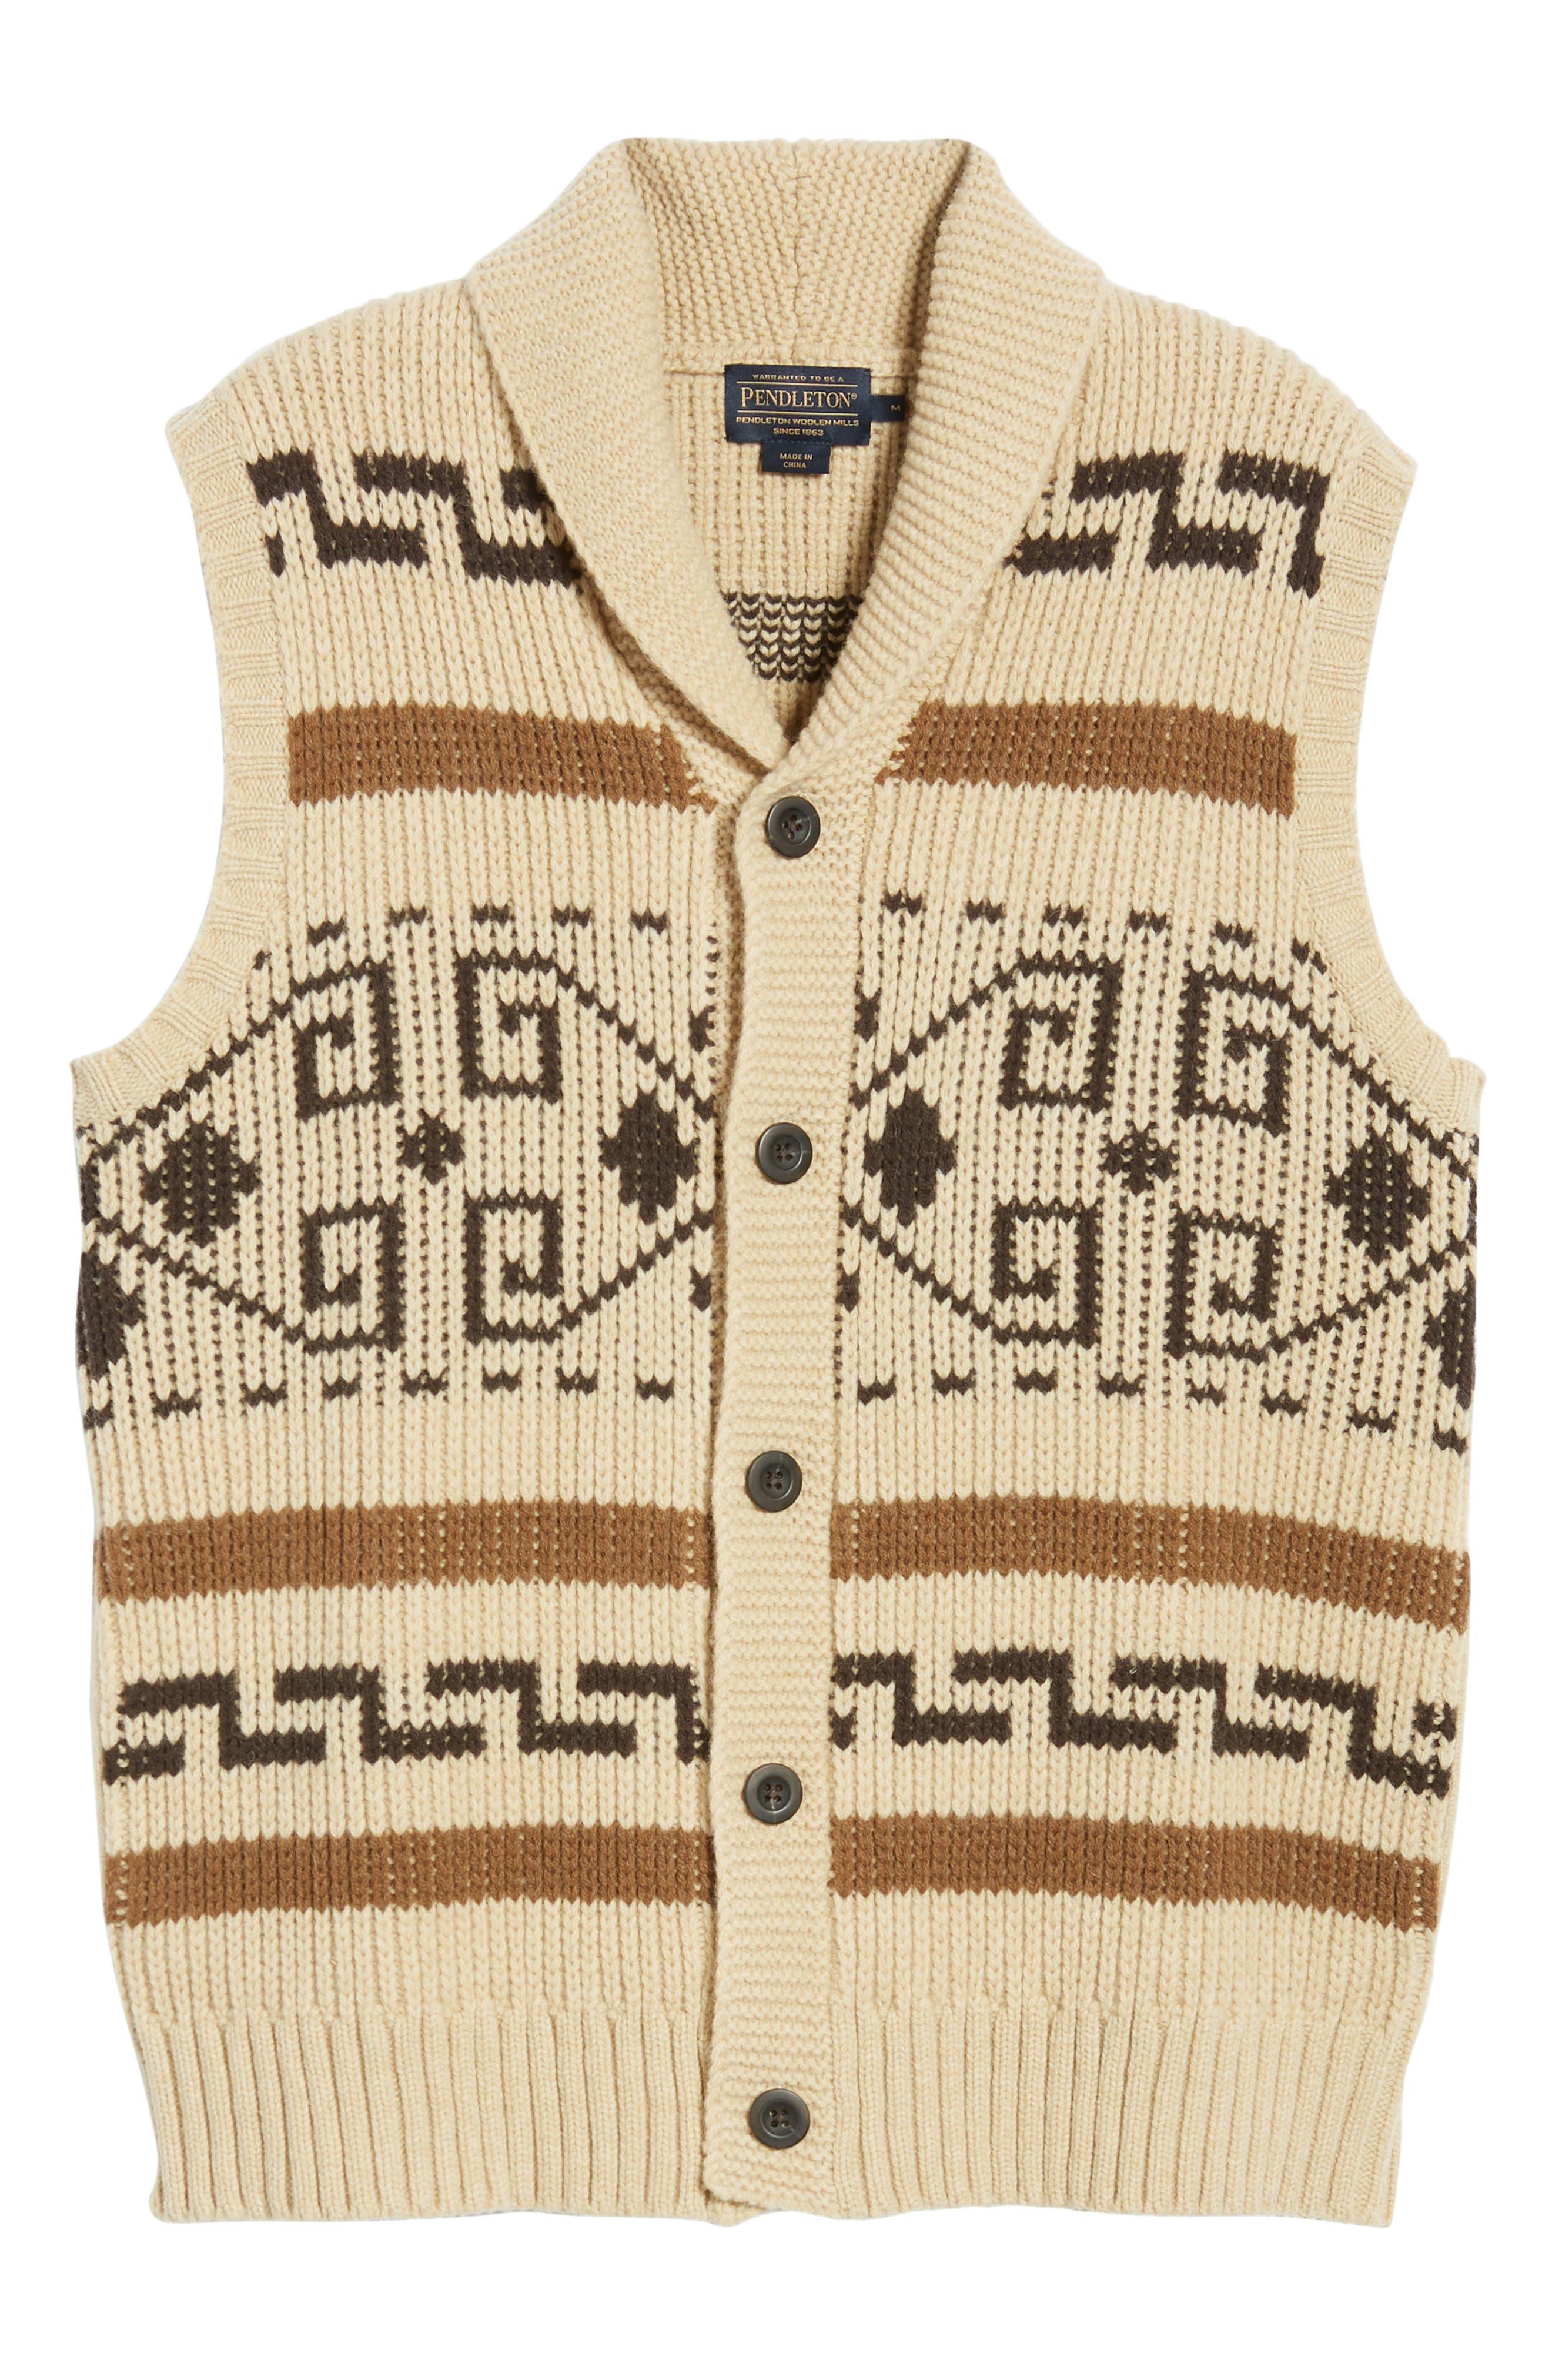 Original Westerley Sweater Vest,                             Alternate thumbnail 5, color,                             TAN/ BROWN